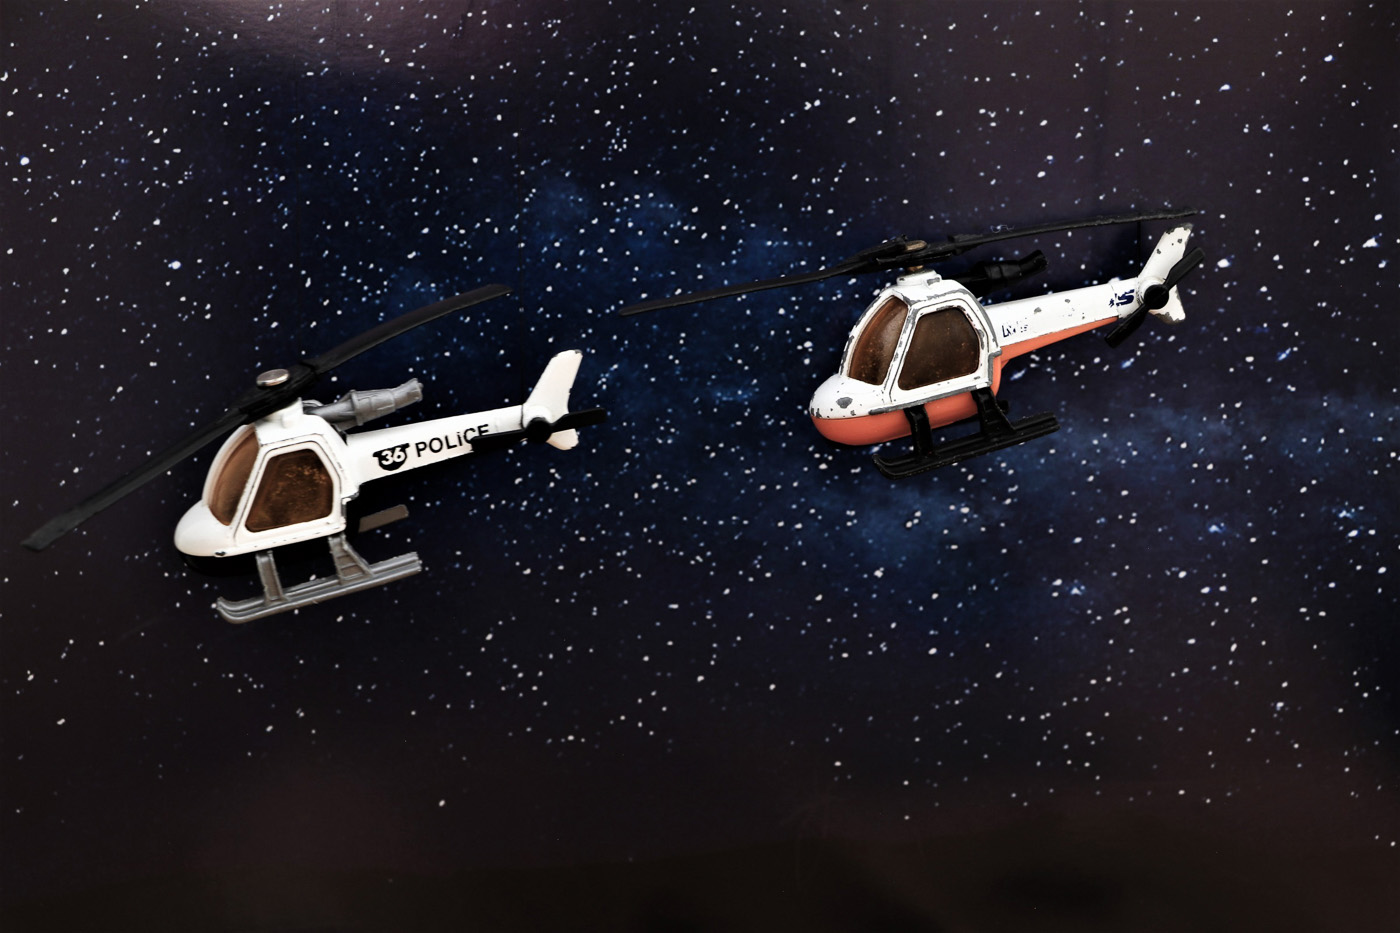 Chopper Race